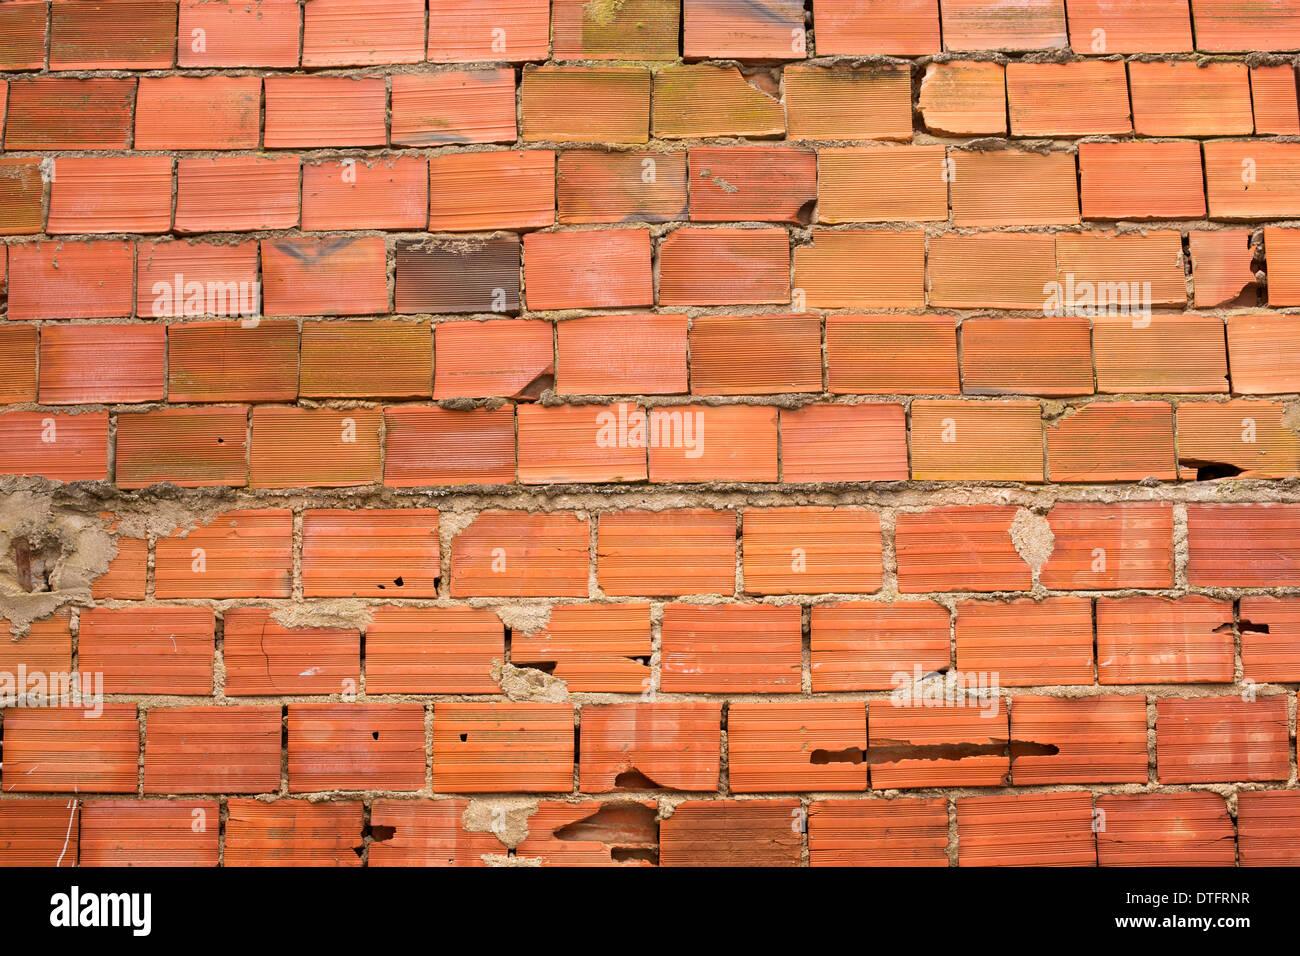 red bricks - Stock Image